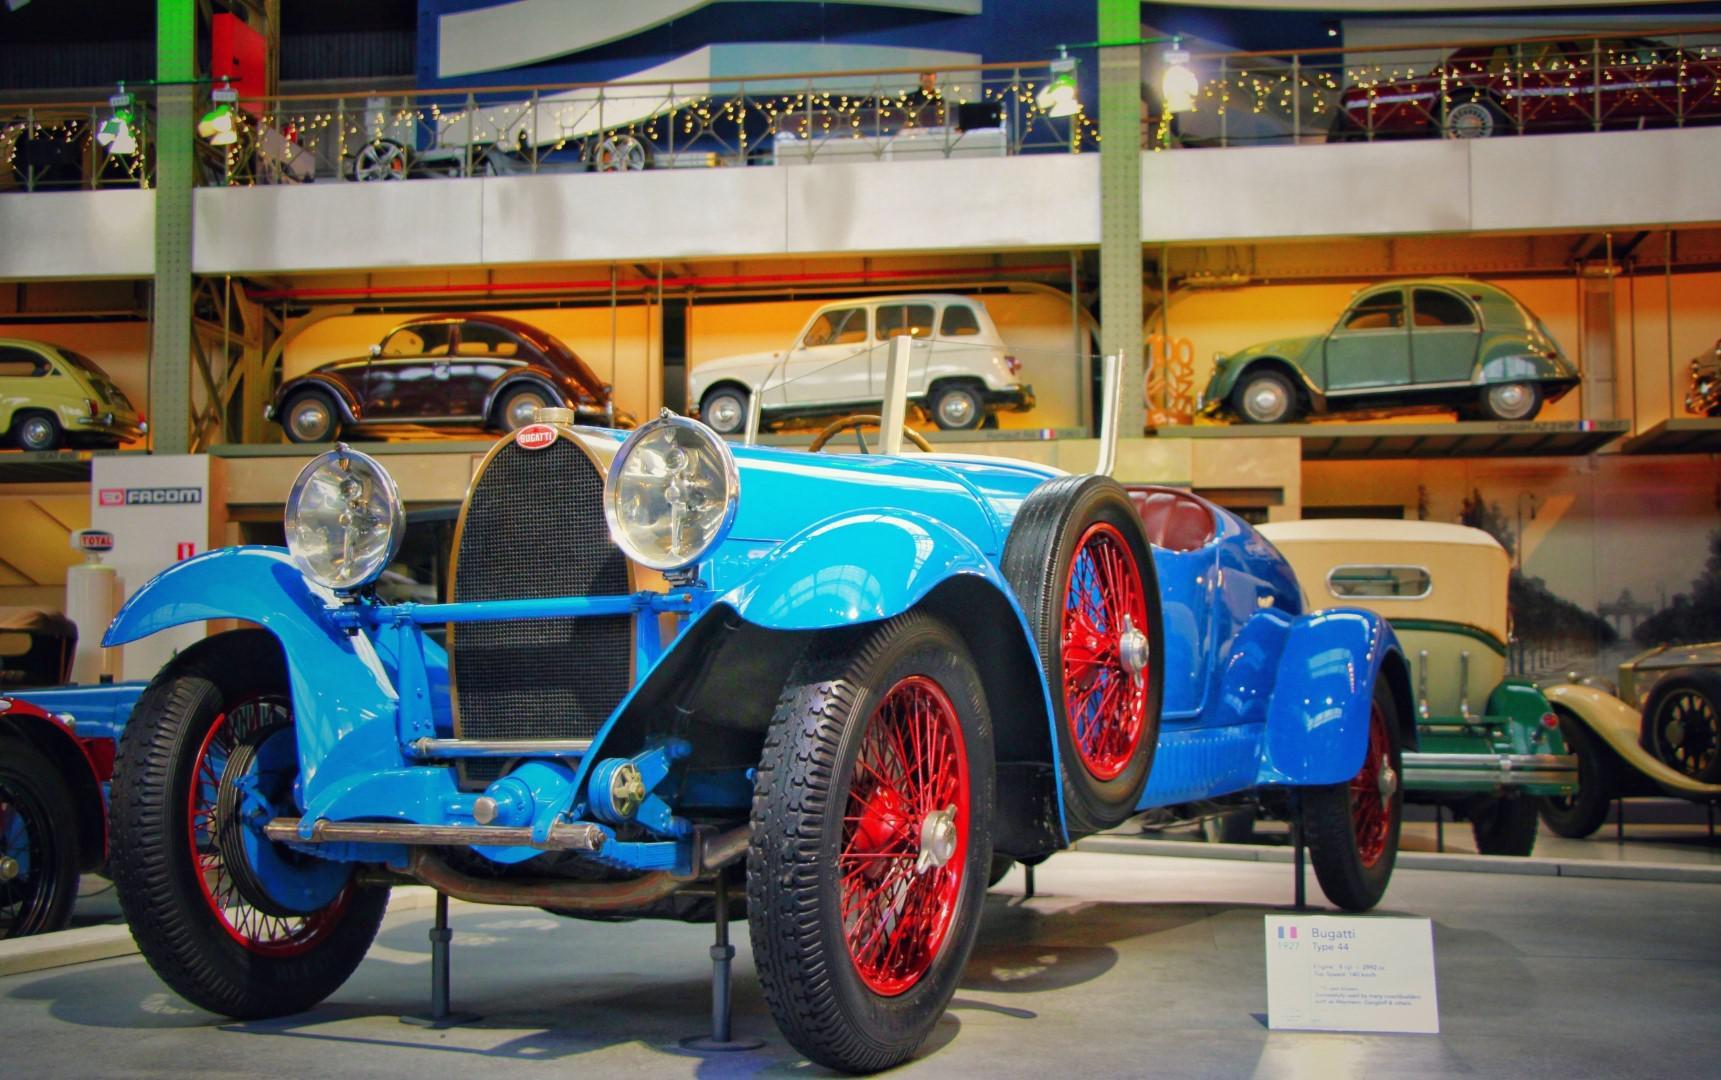 nous-avons-visite-so-british-cars-amp-lifestyle-1179-10.jpeg